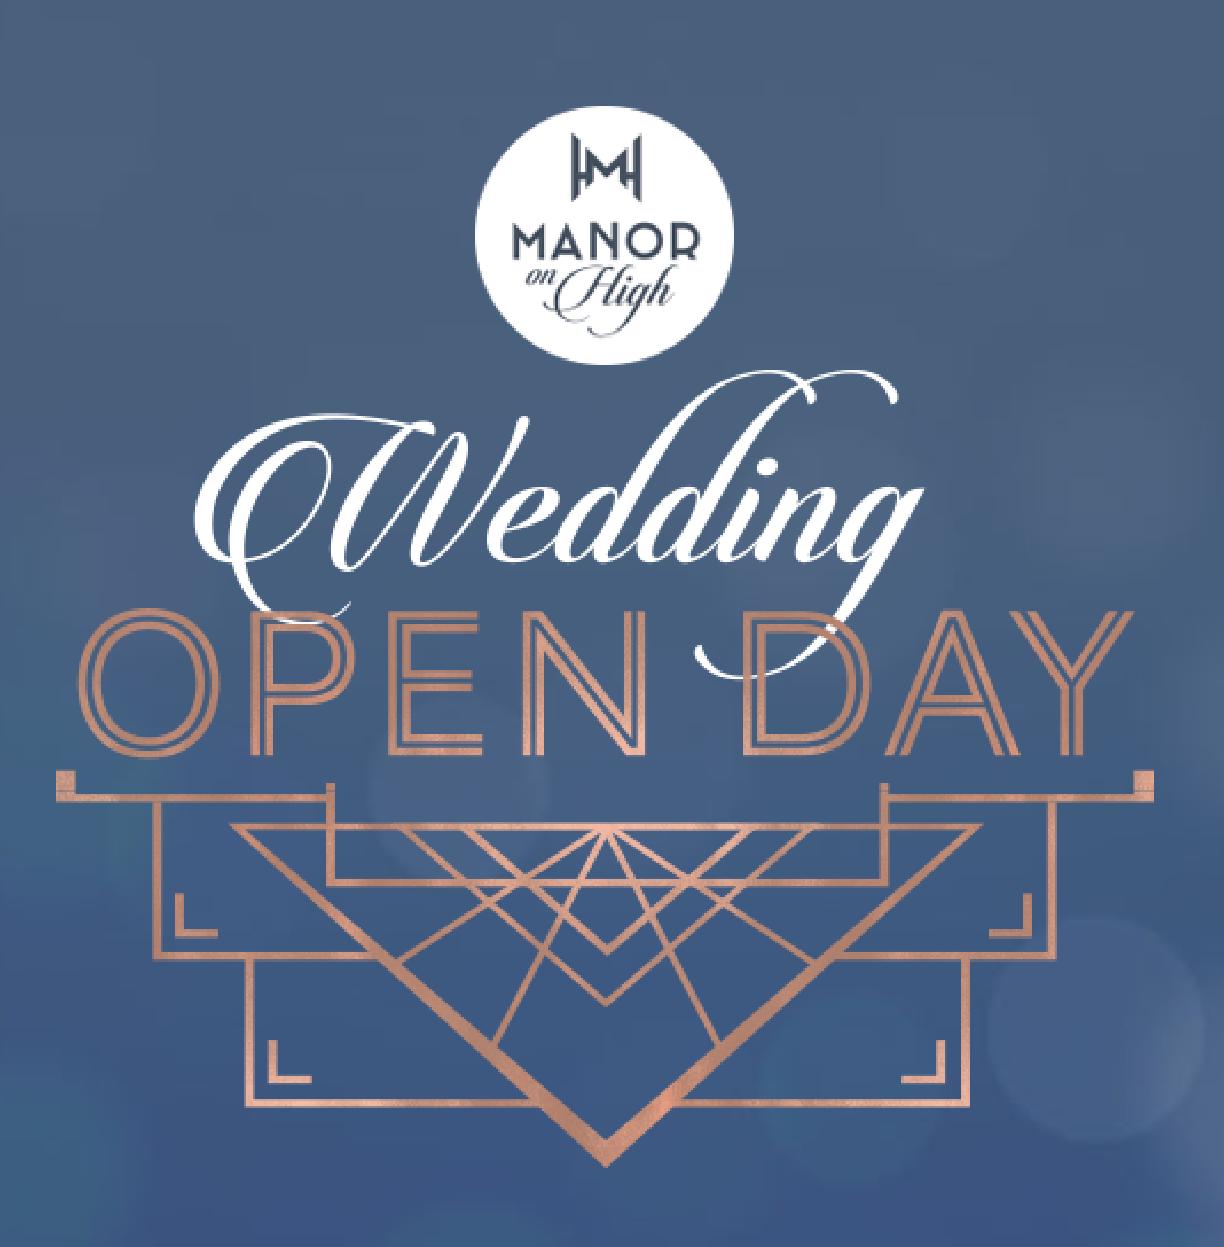 Manor On High Wedding Open Day